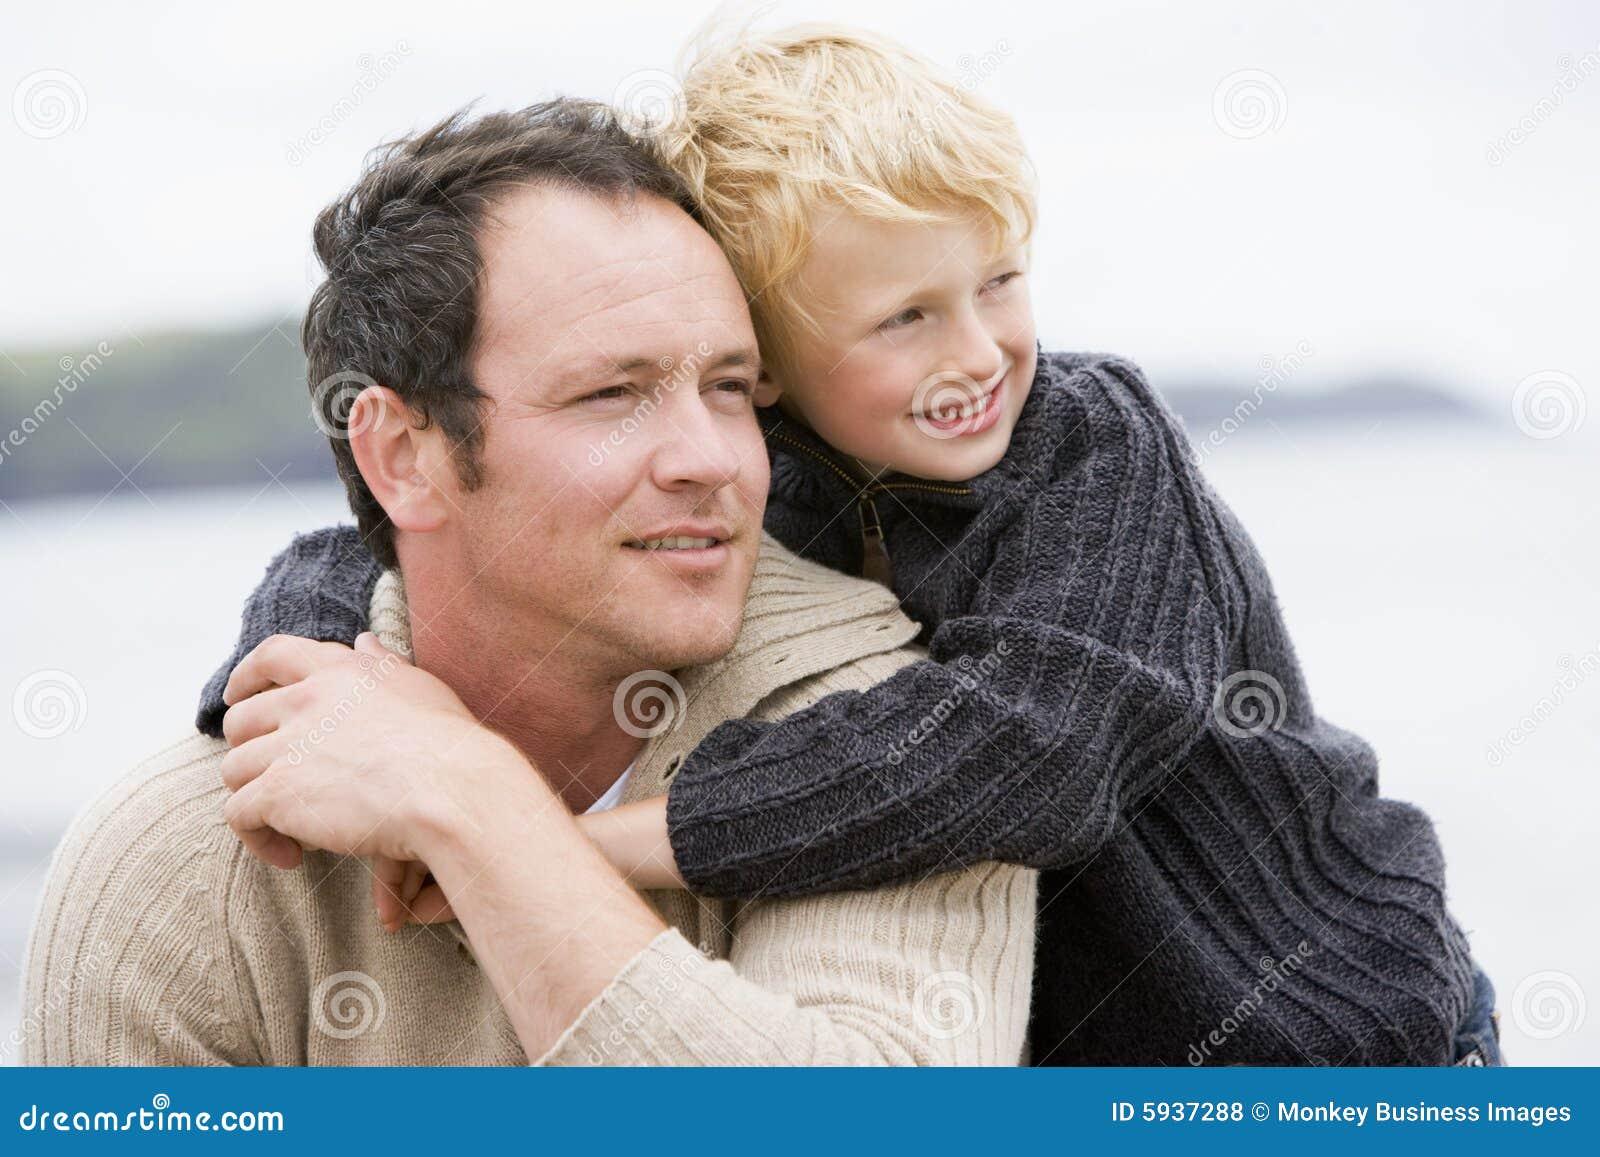 Расказ про отчима 6 фотография